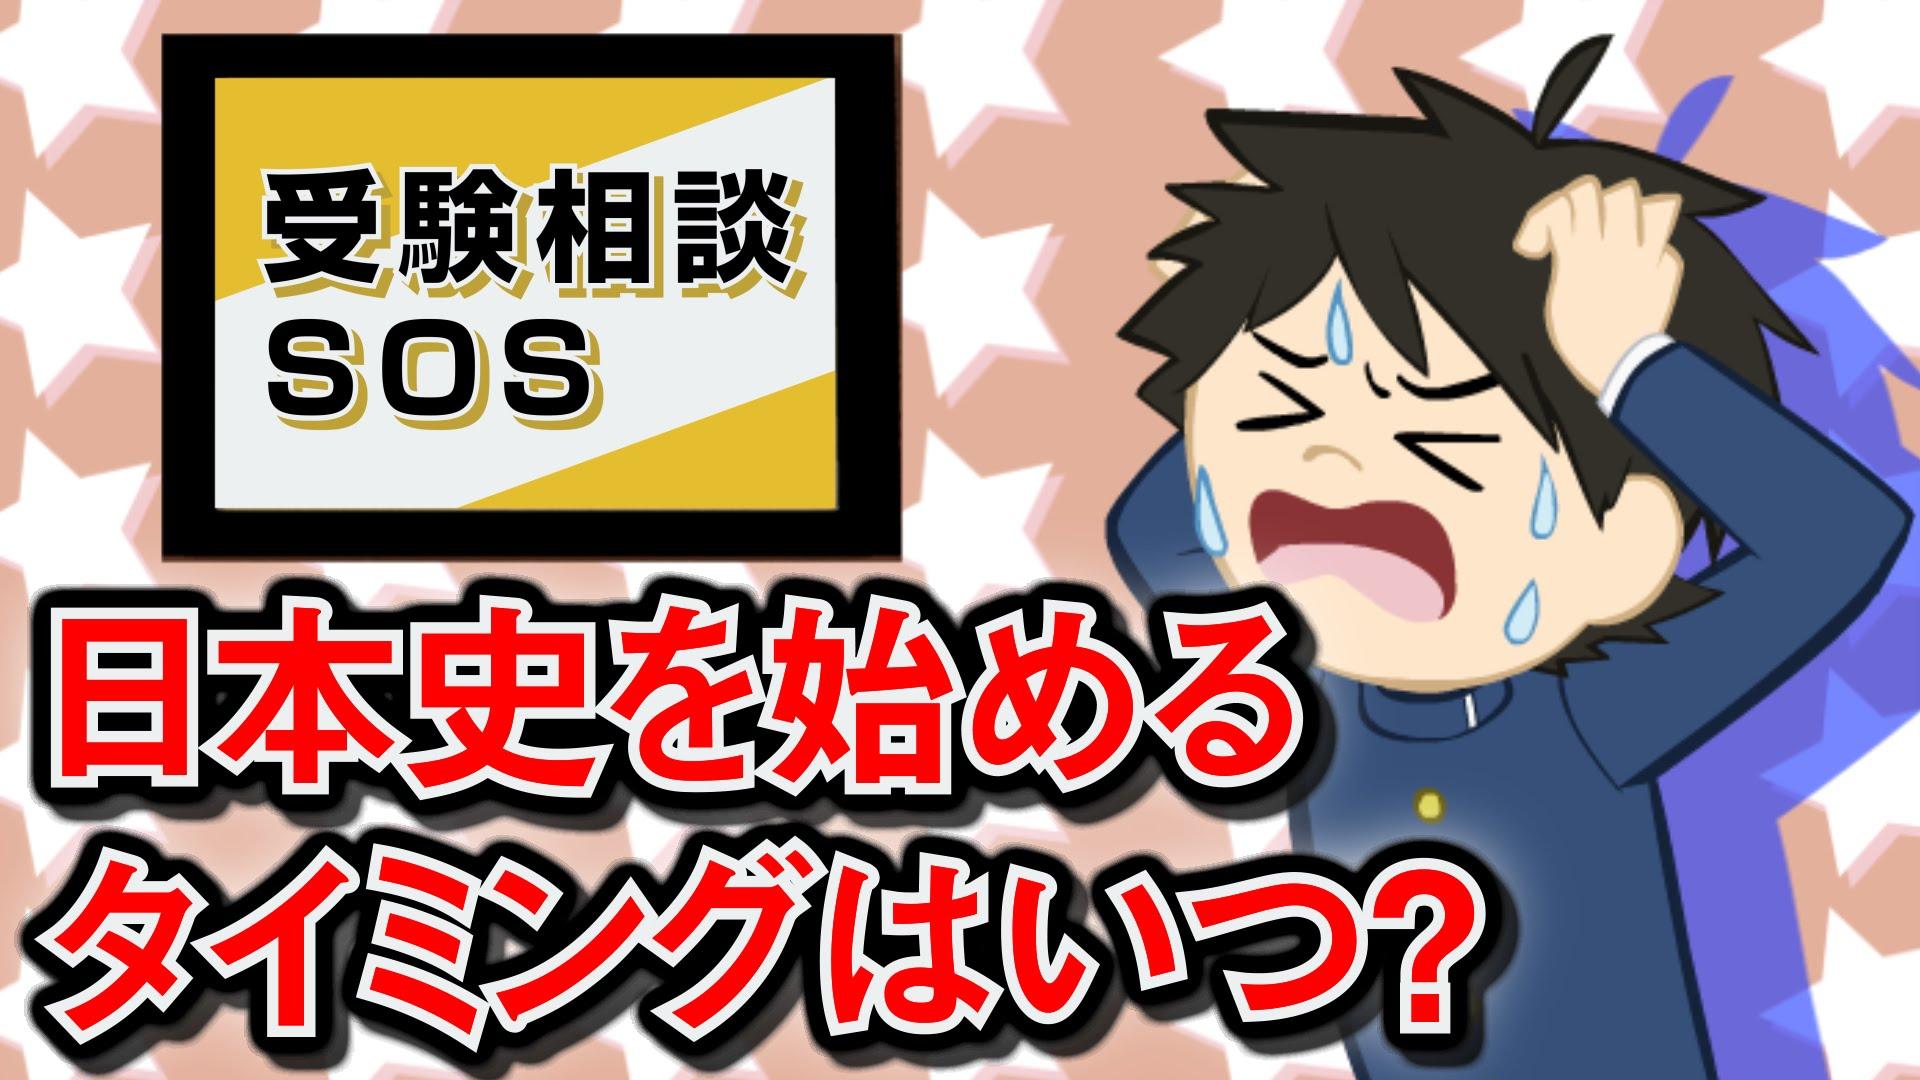 【vol.66】日本史を始める最適なタイミング!? 受験相談SOS